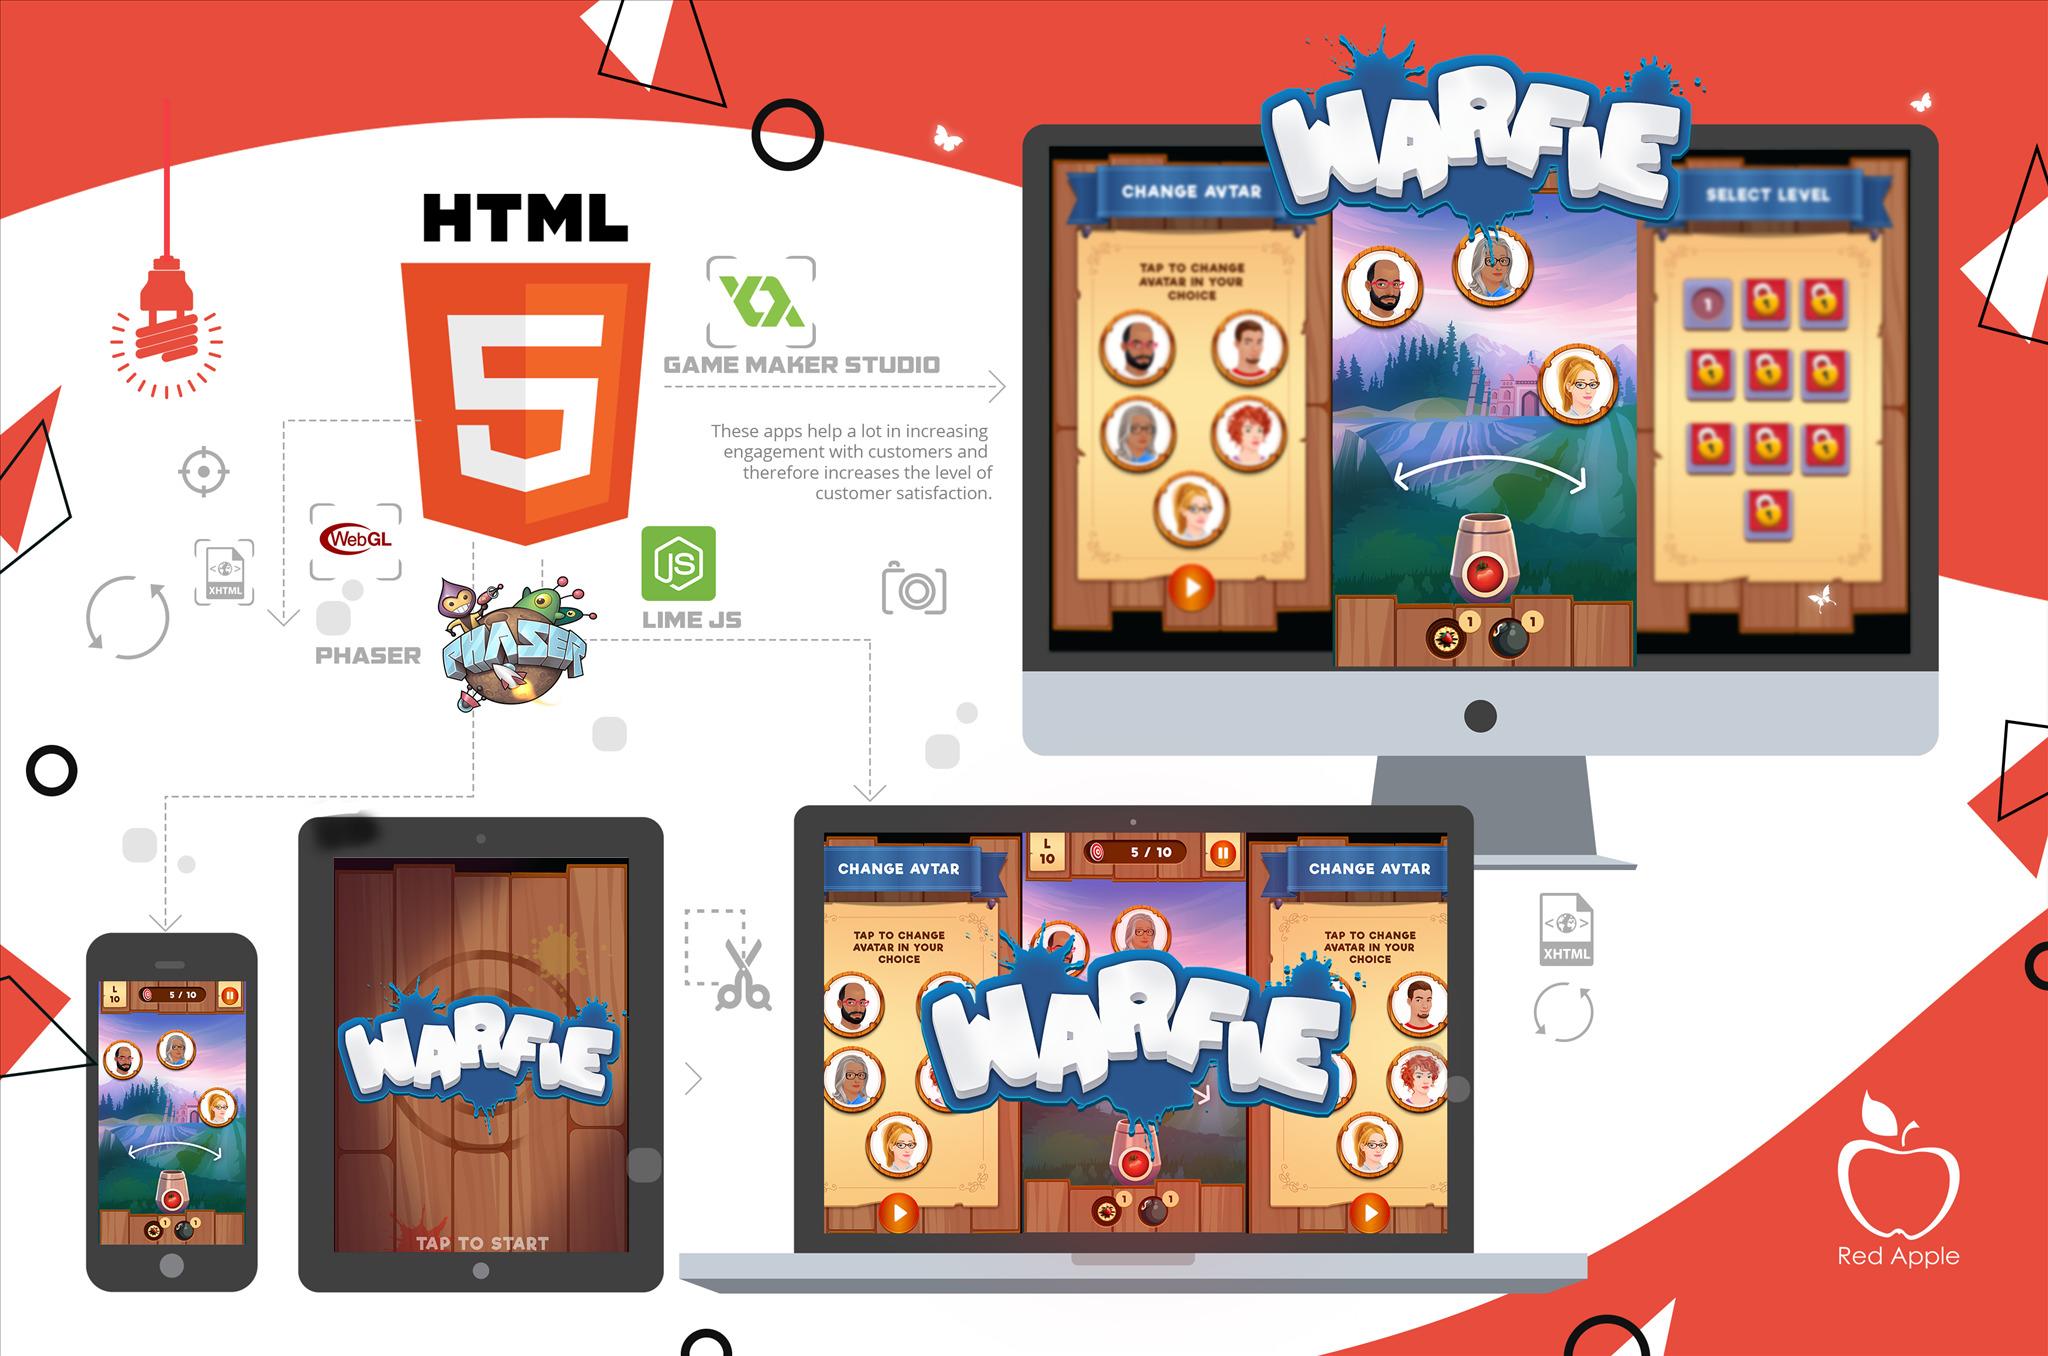 html5_game.jpg